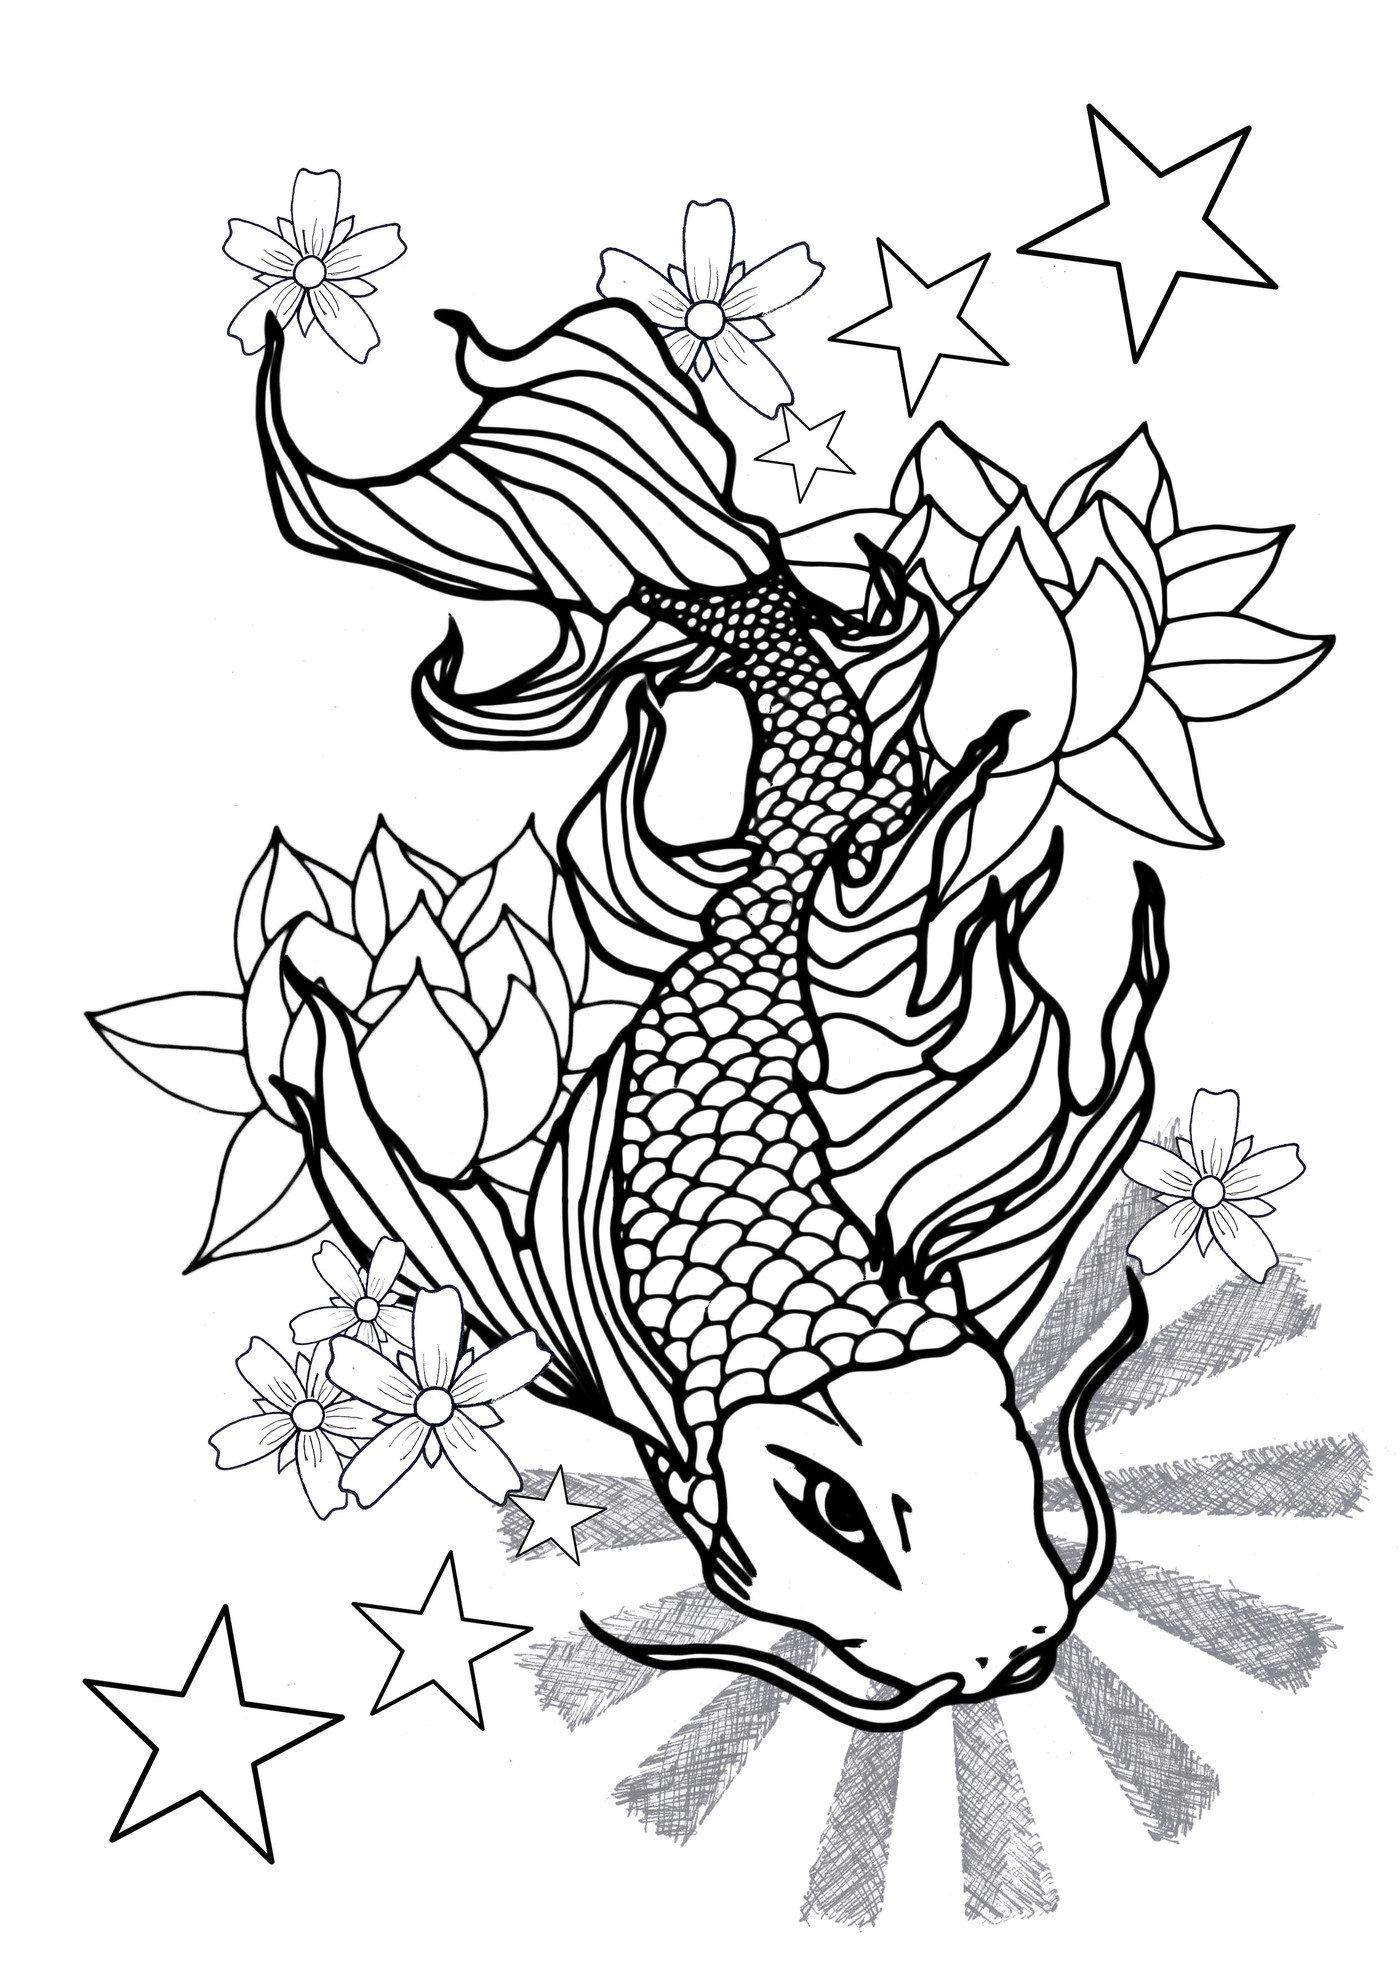 Tattoo Design by David Ketley at Coroflot.com